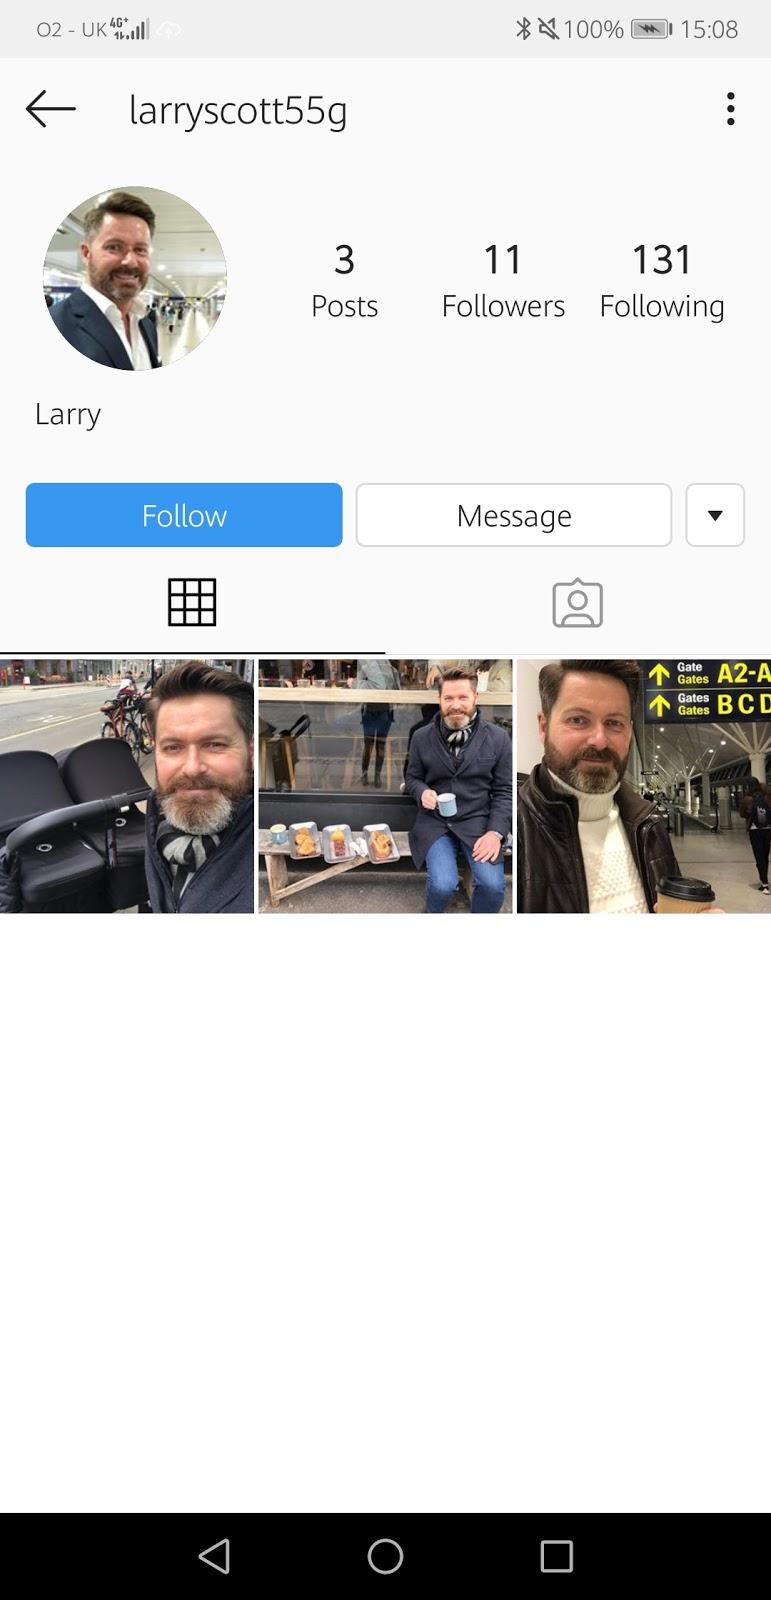 InstaScams: More fake accounts using CAPTAIN THOMAS